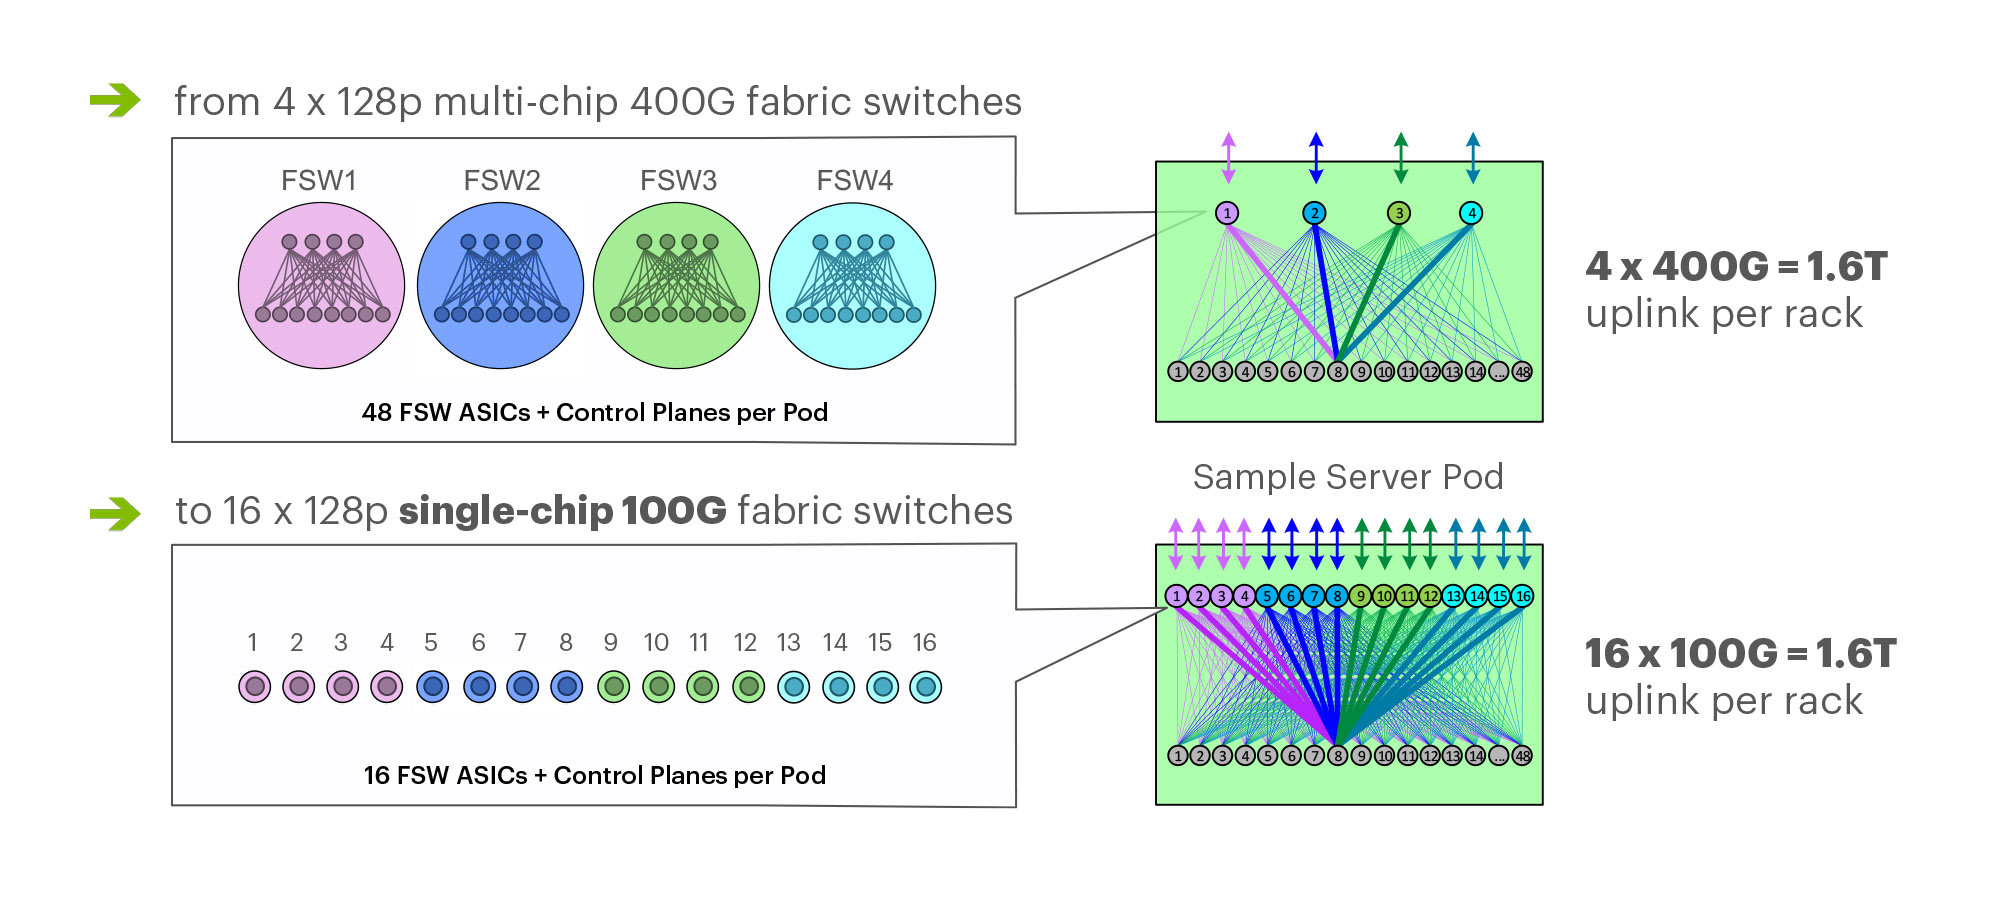 Multichip 400G pod fabric switch topology vs. single-chip F16 at 100G.